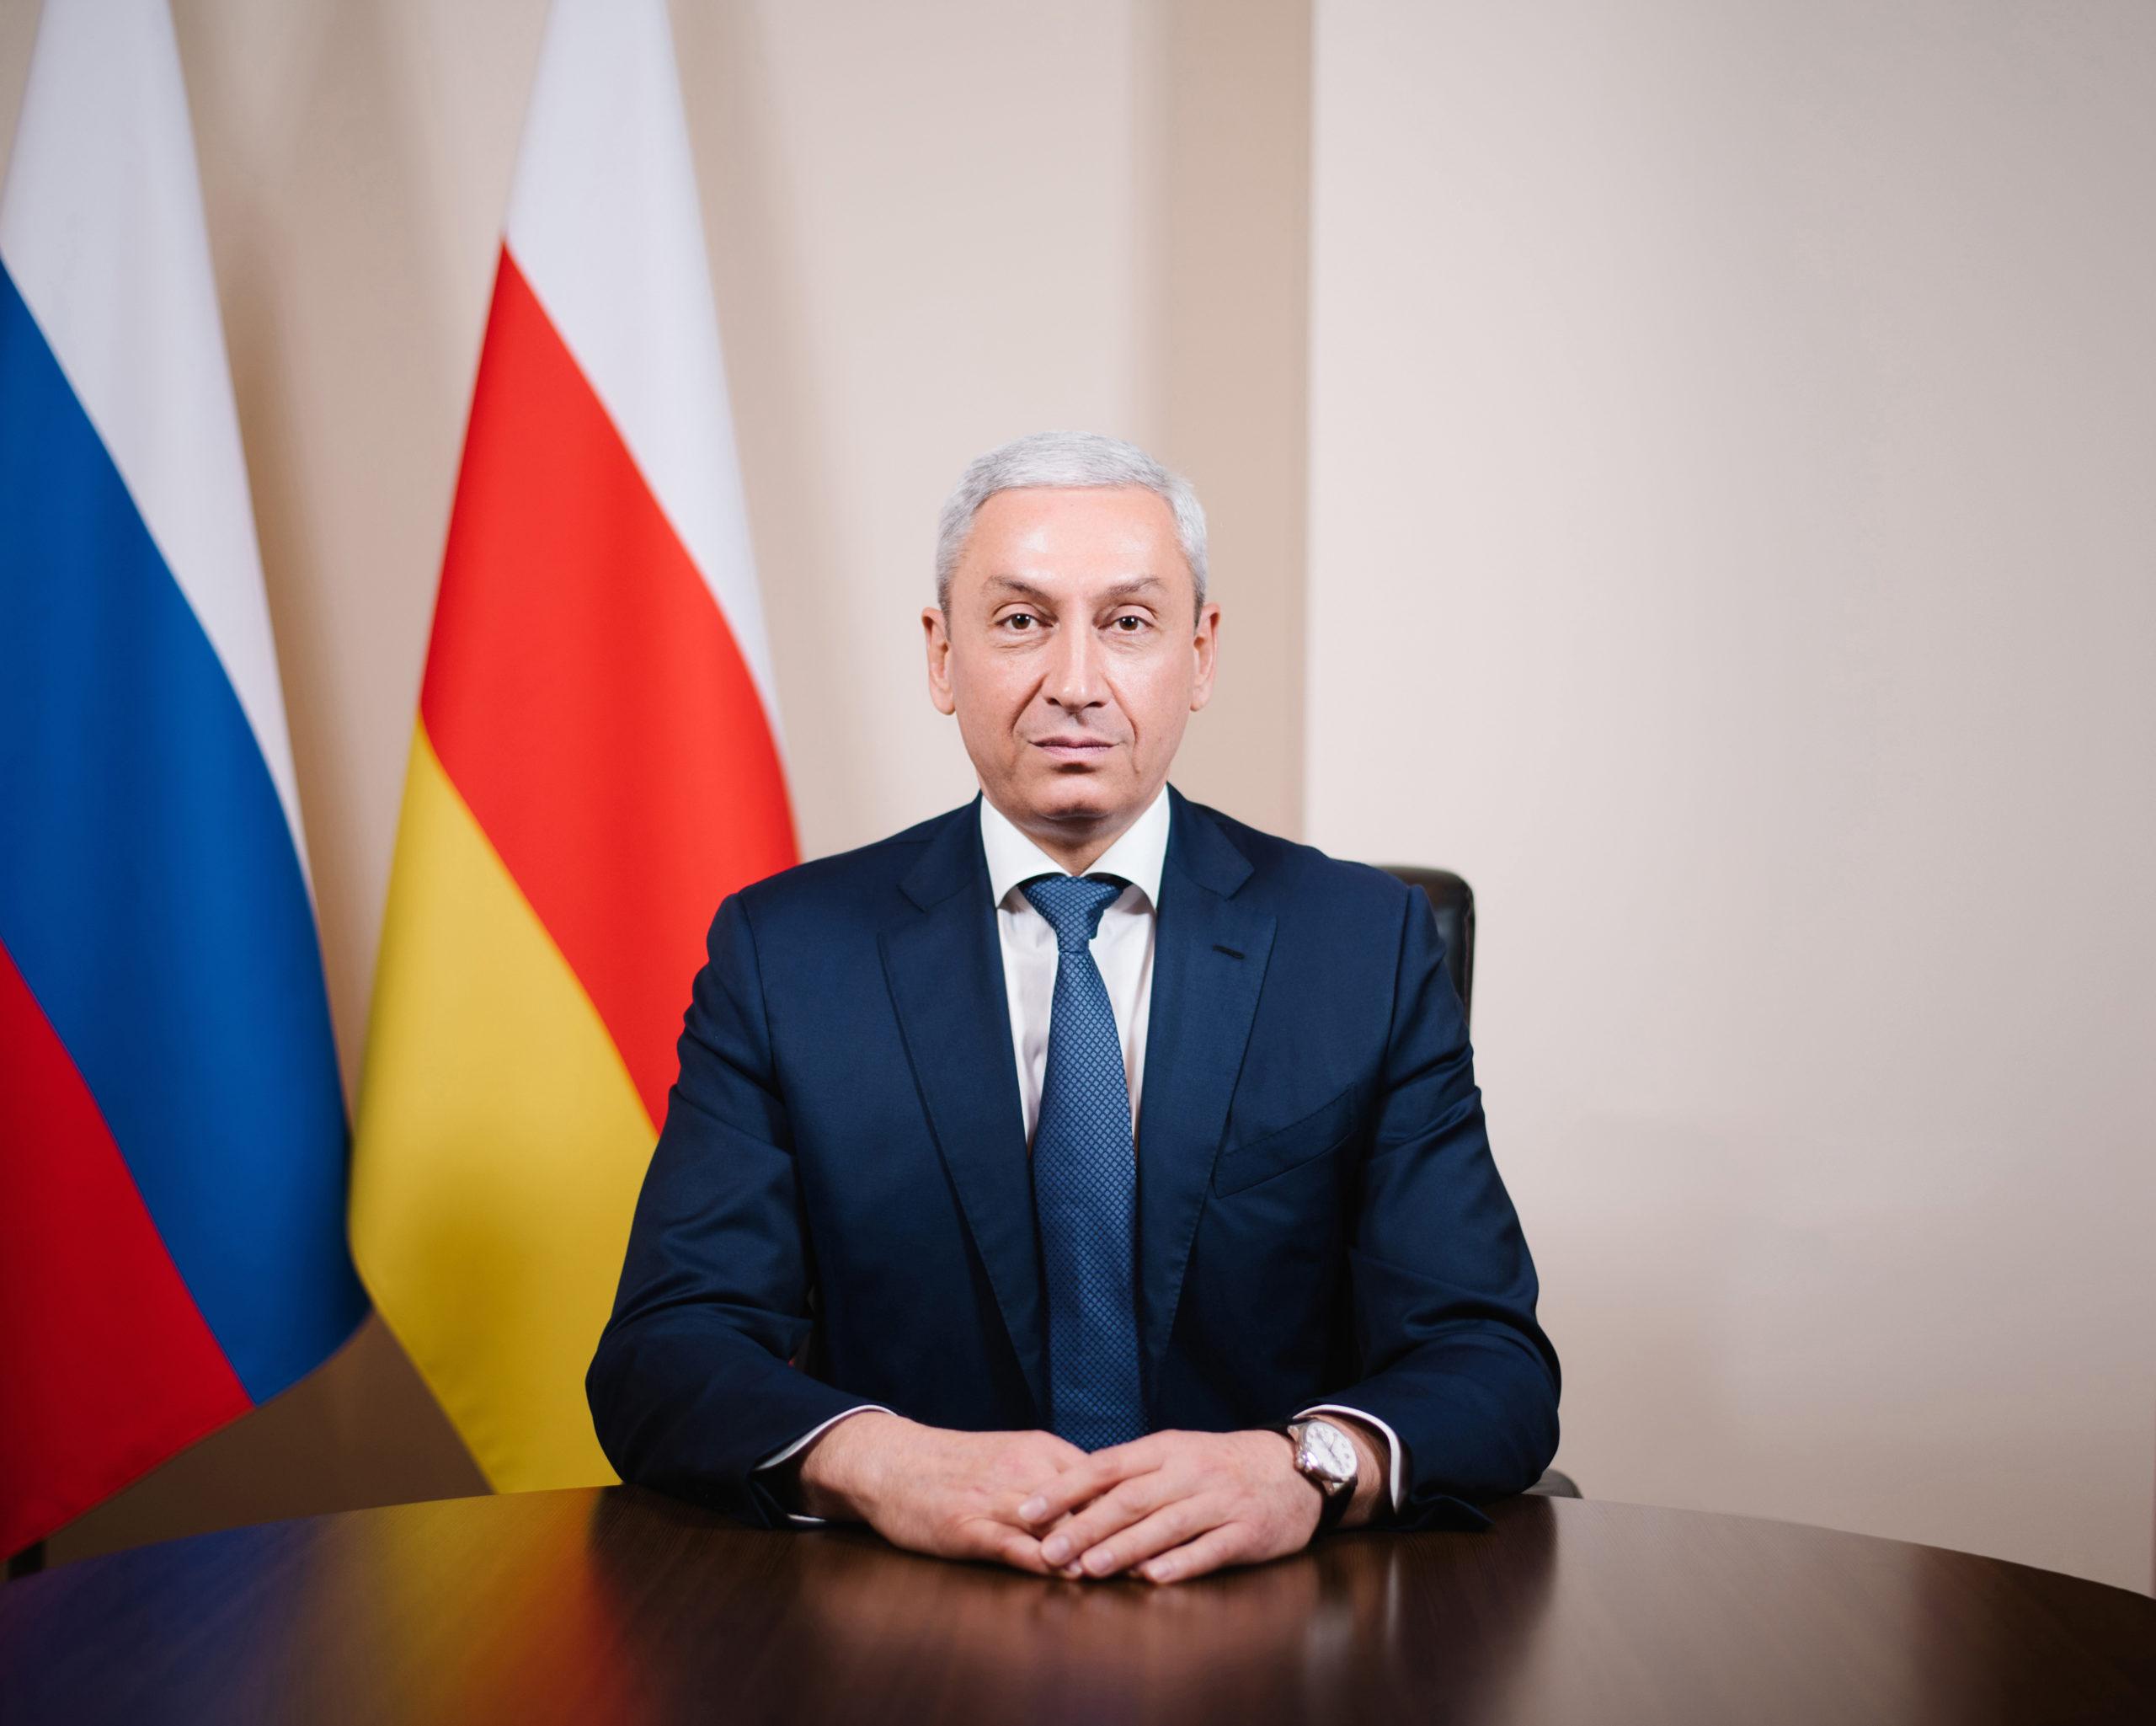 Поздравление полпреда Бориса Джанаева с Днем защитника Отечества